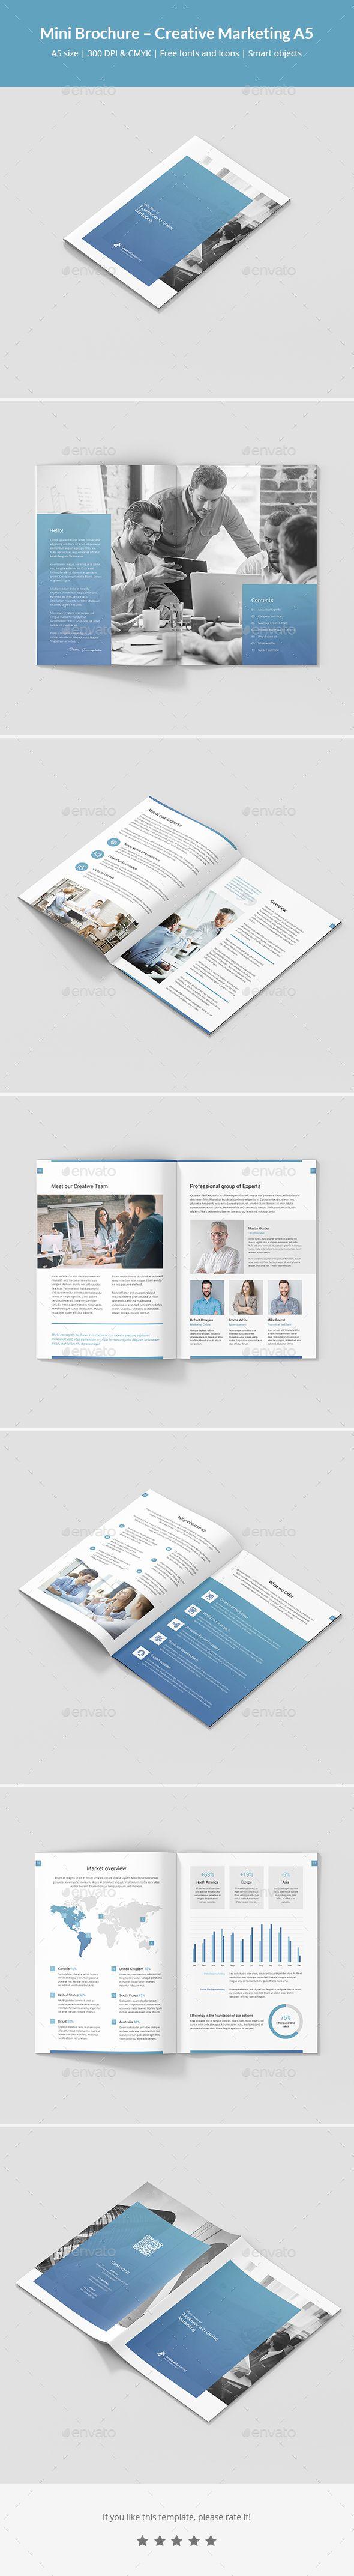 Mini Brochure Creative Marketing A5 Brochures Brochure Template